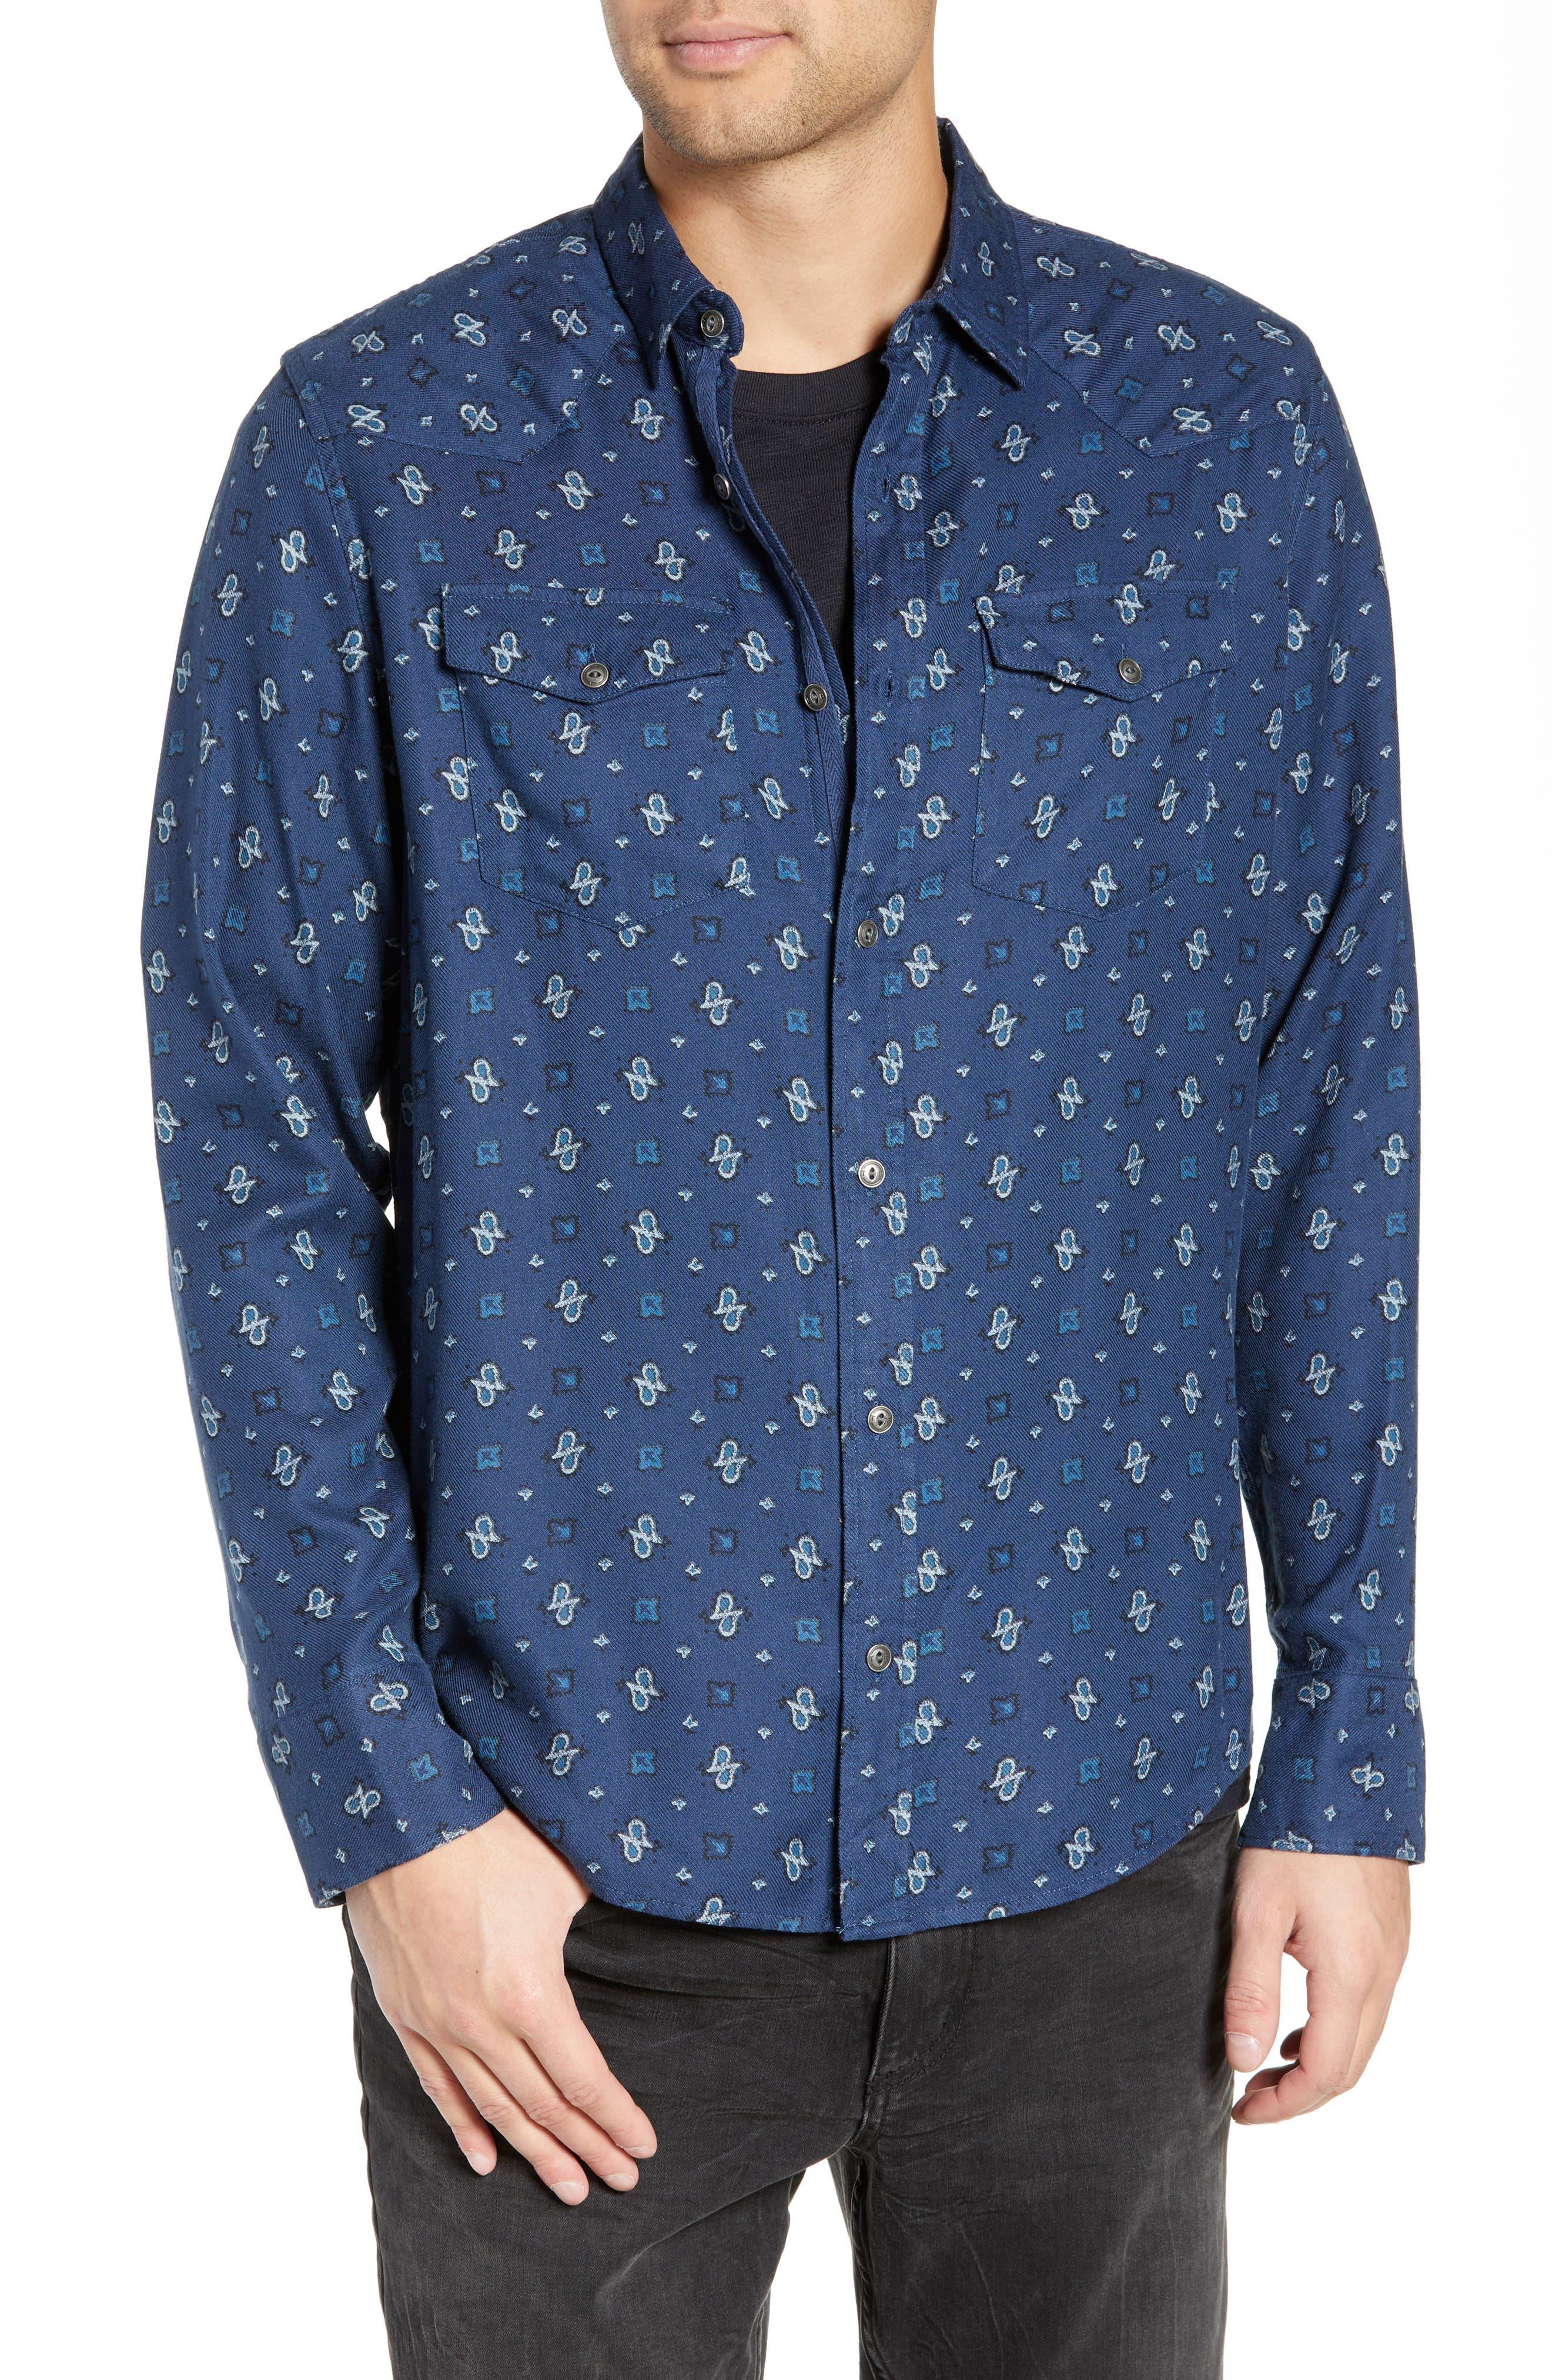 Regular Fit Paisley Western Shirt,                         Main,                         color, BLUE CASPIA DESERT PAISLEY